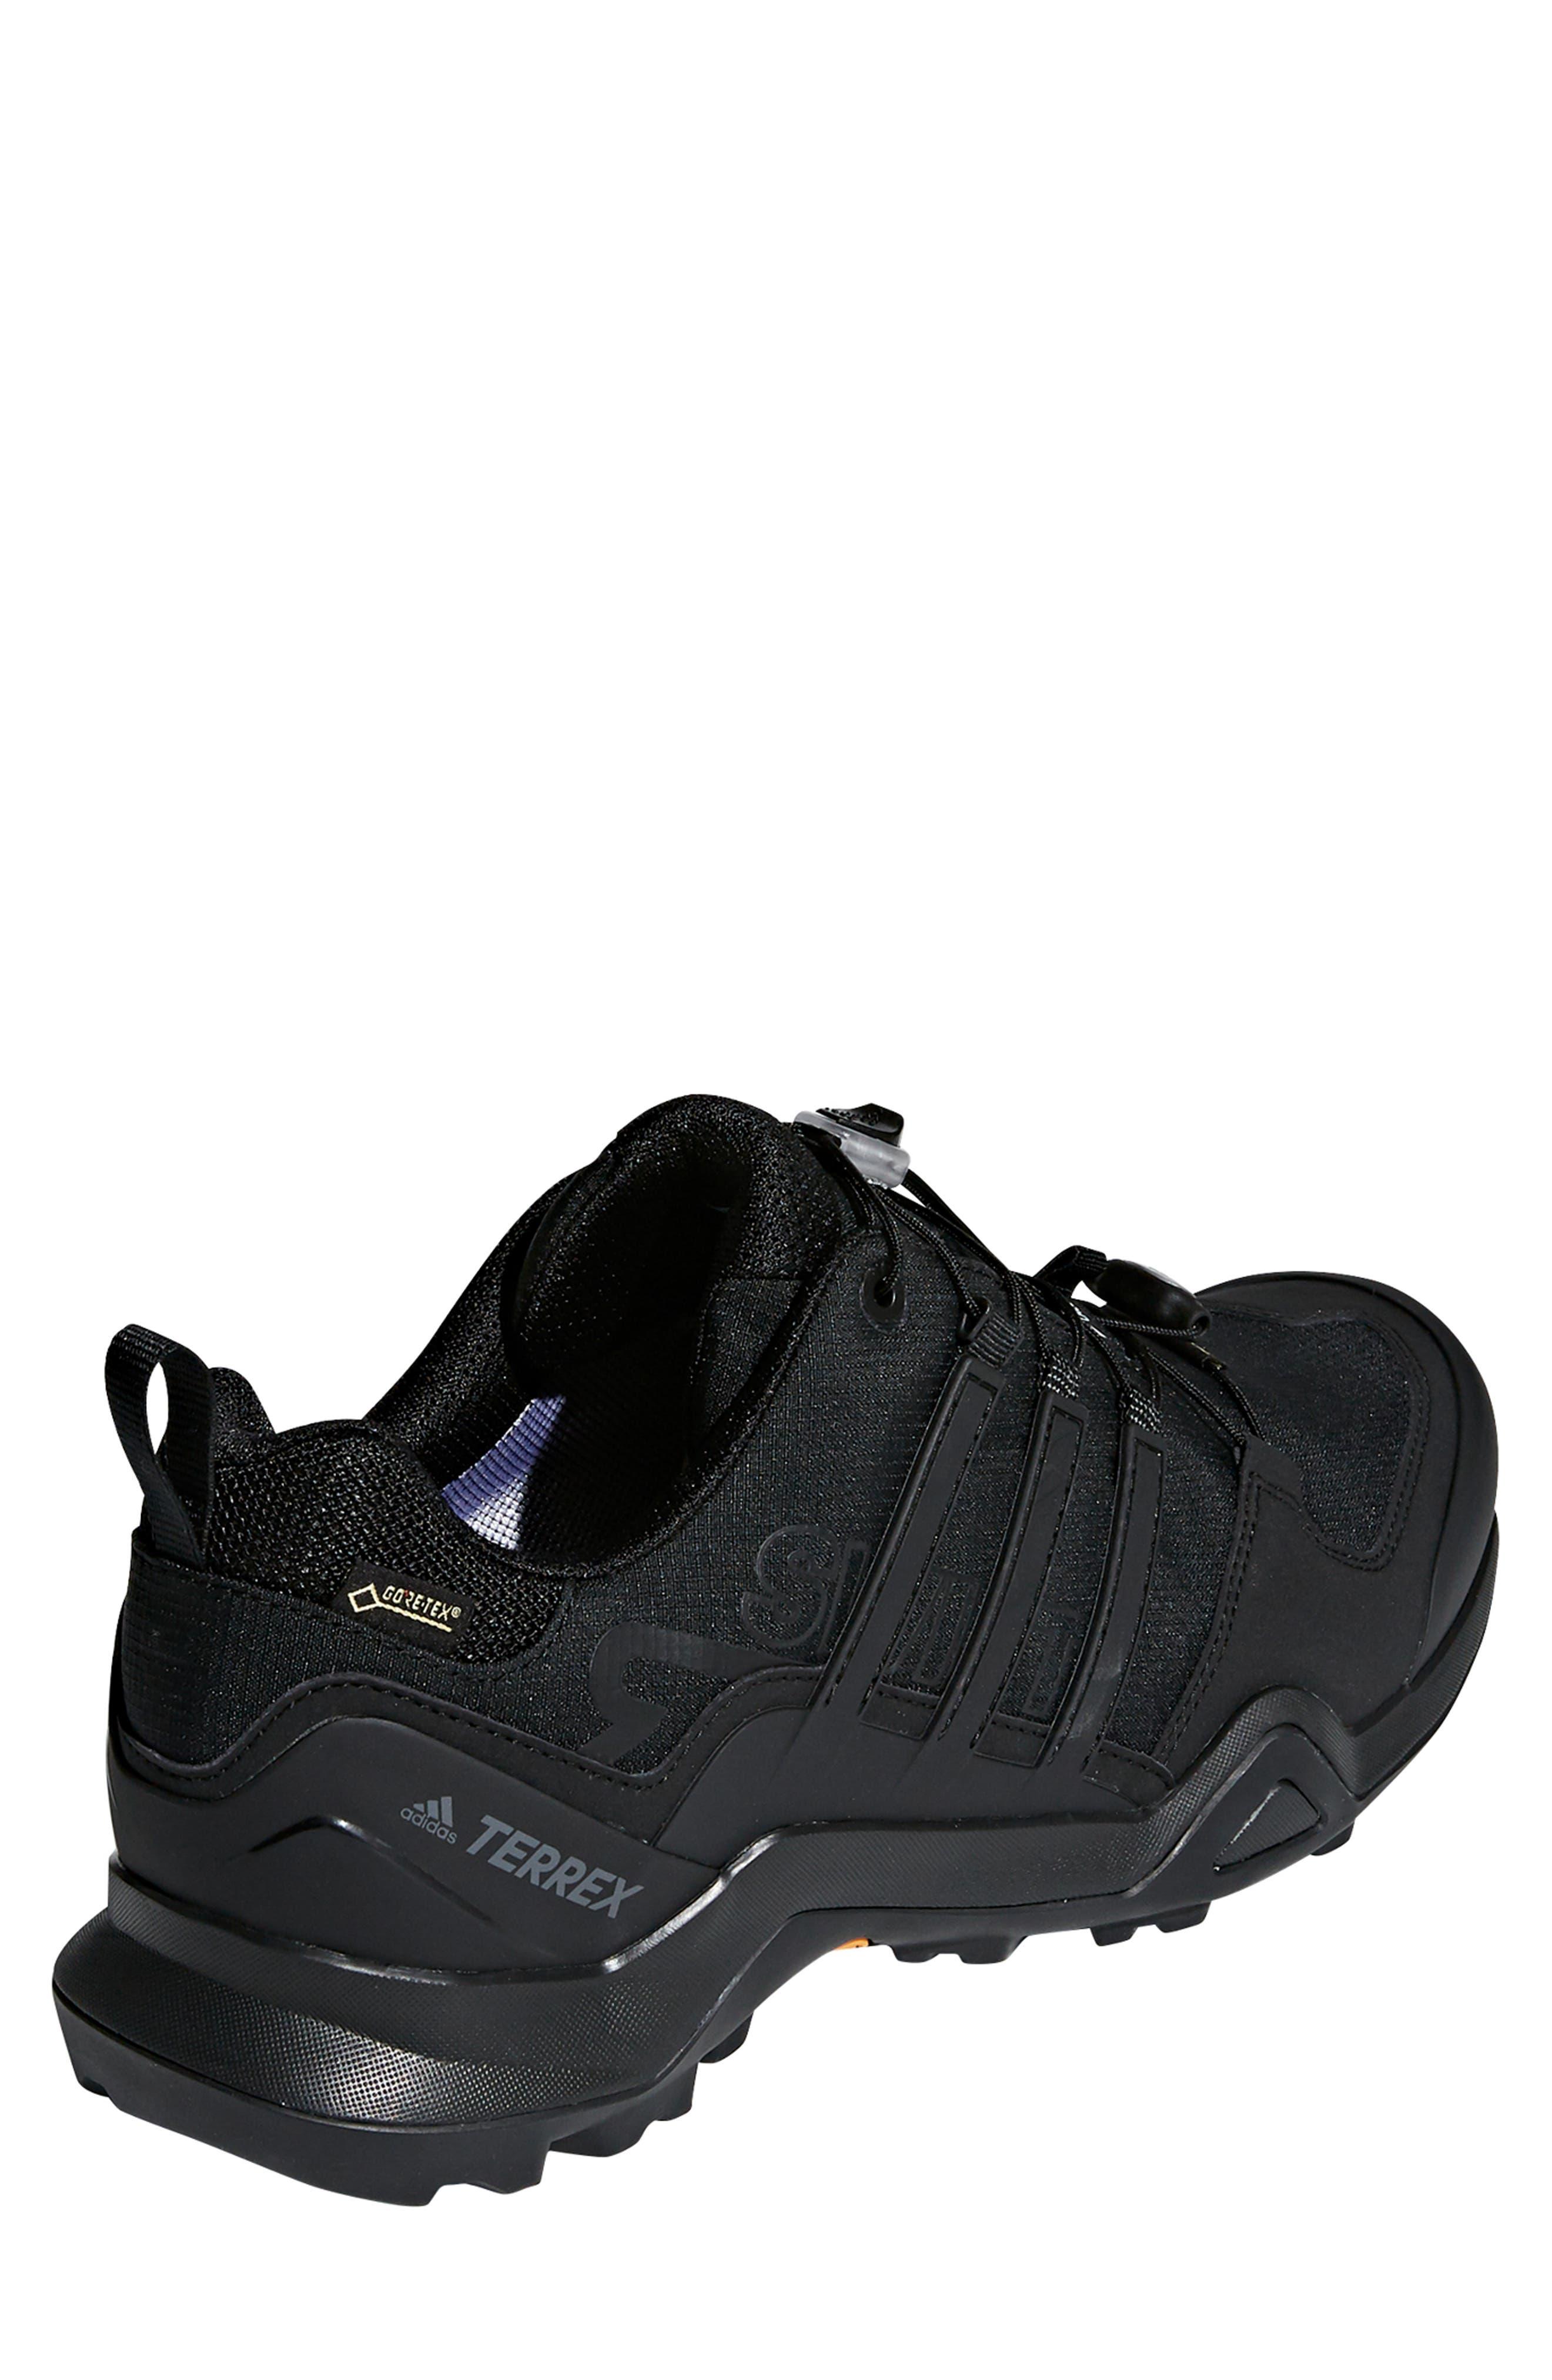 ADIDAS,                             Terrex Swift R2 GTX Gore-Tex<sup>®</sup> Waterproof Hiking Shoe,                             Alternate thumbnail 2, color,                             BLACK/ BLACK/ BLACK